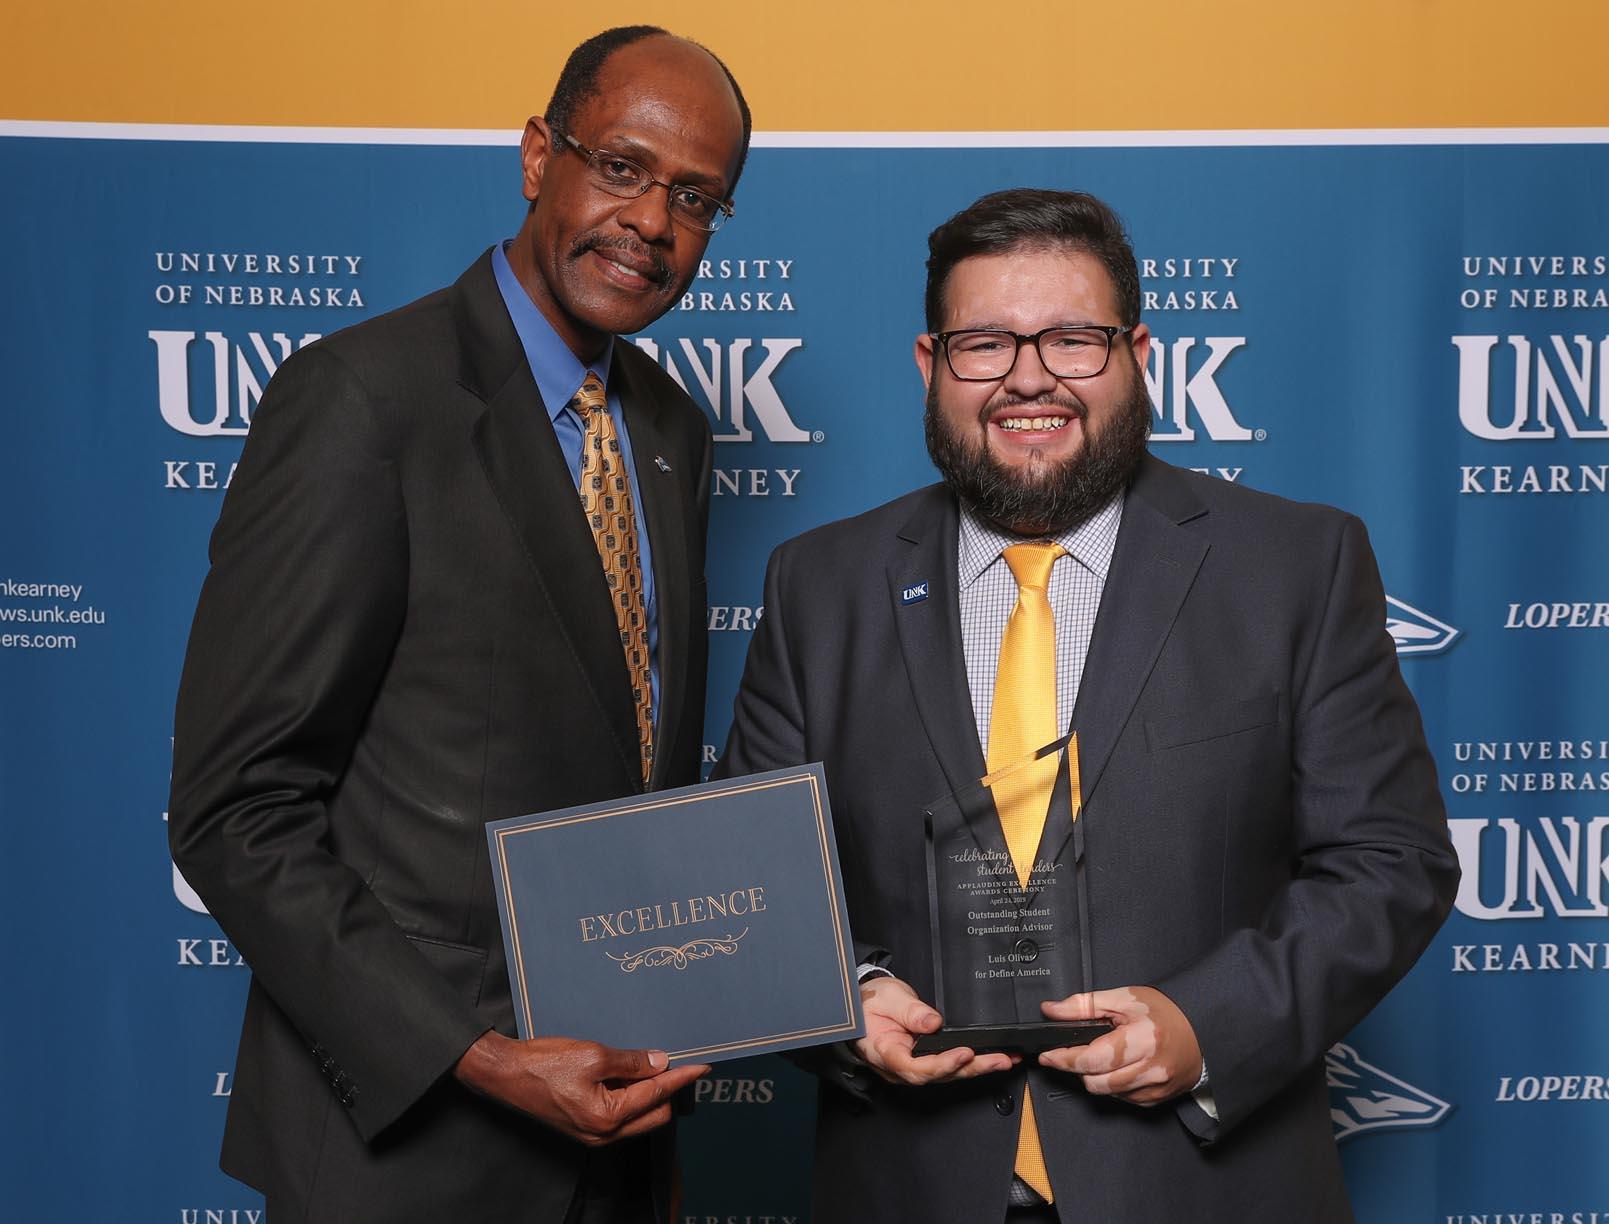 Outstanding Student Organization Adviser - Luis Olivas